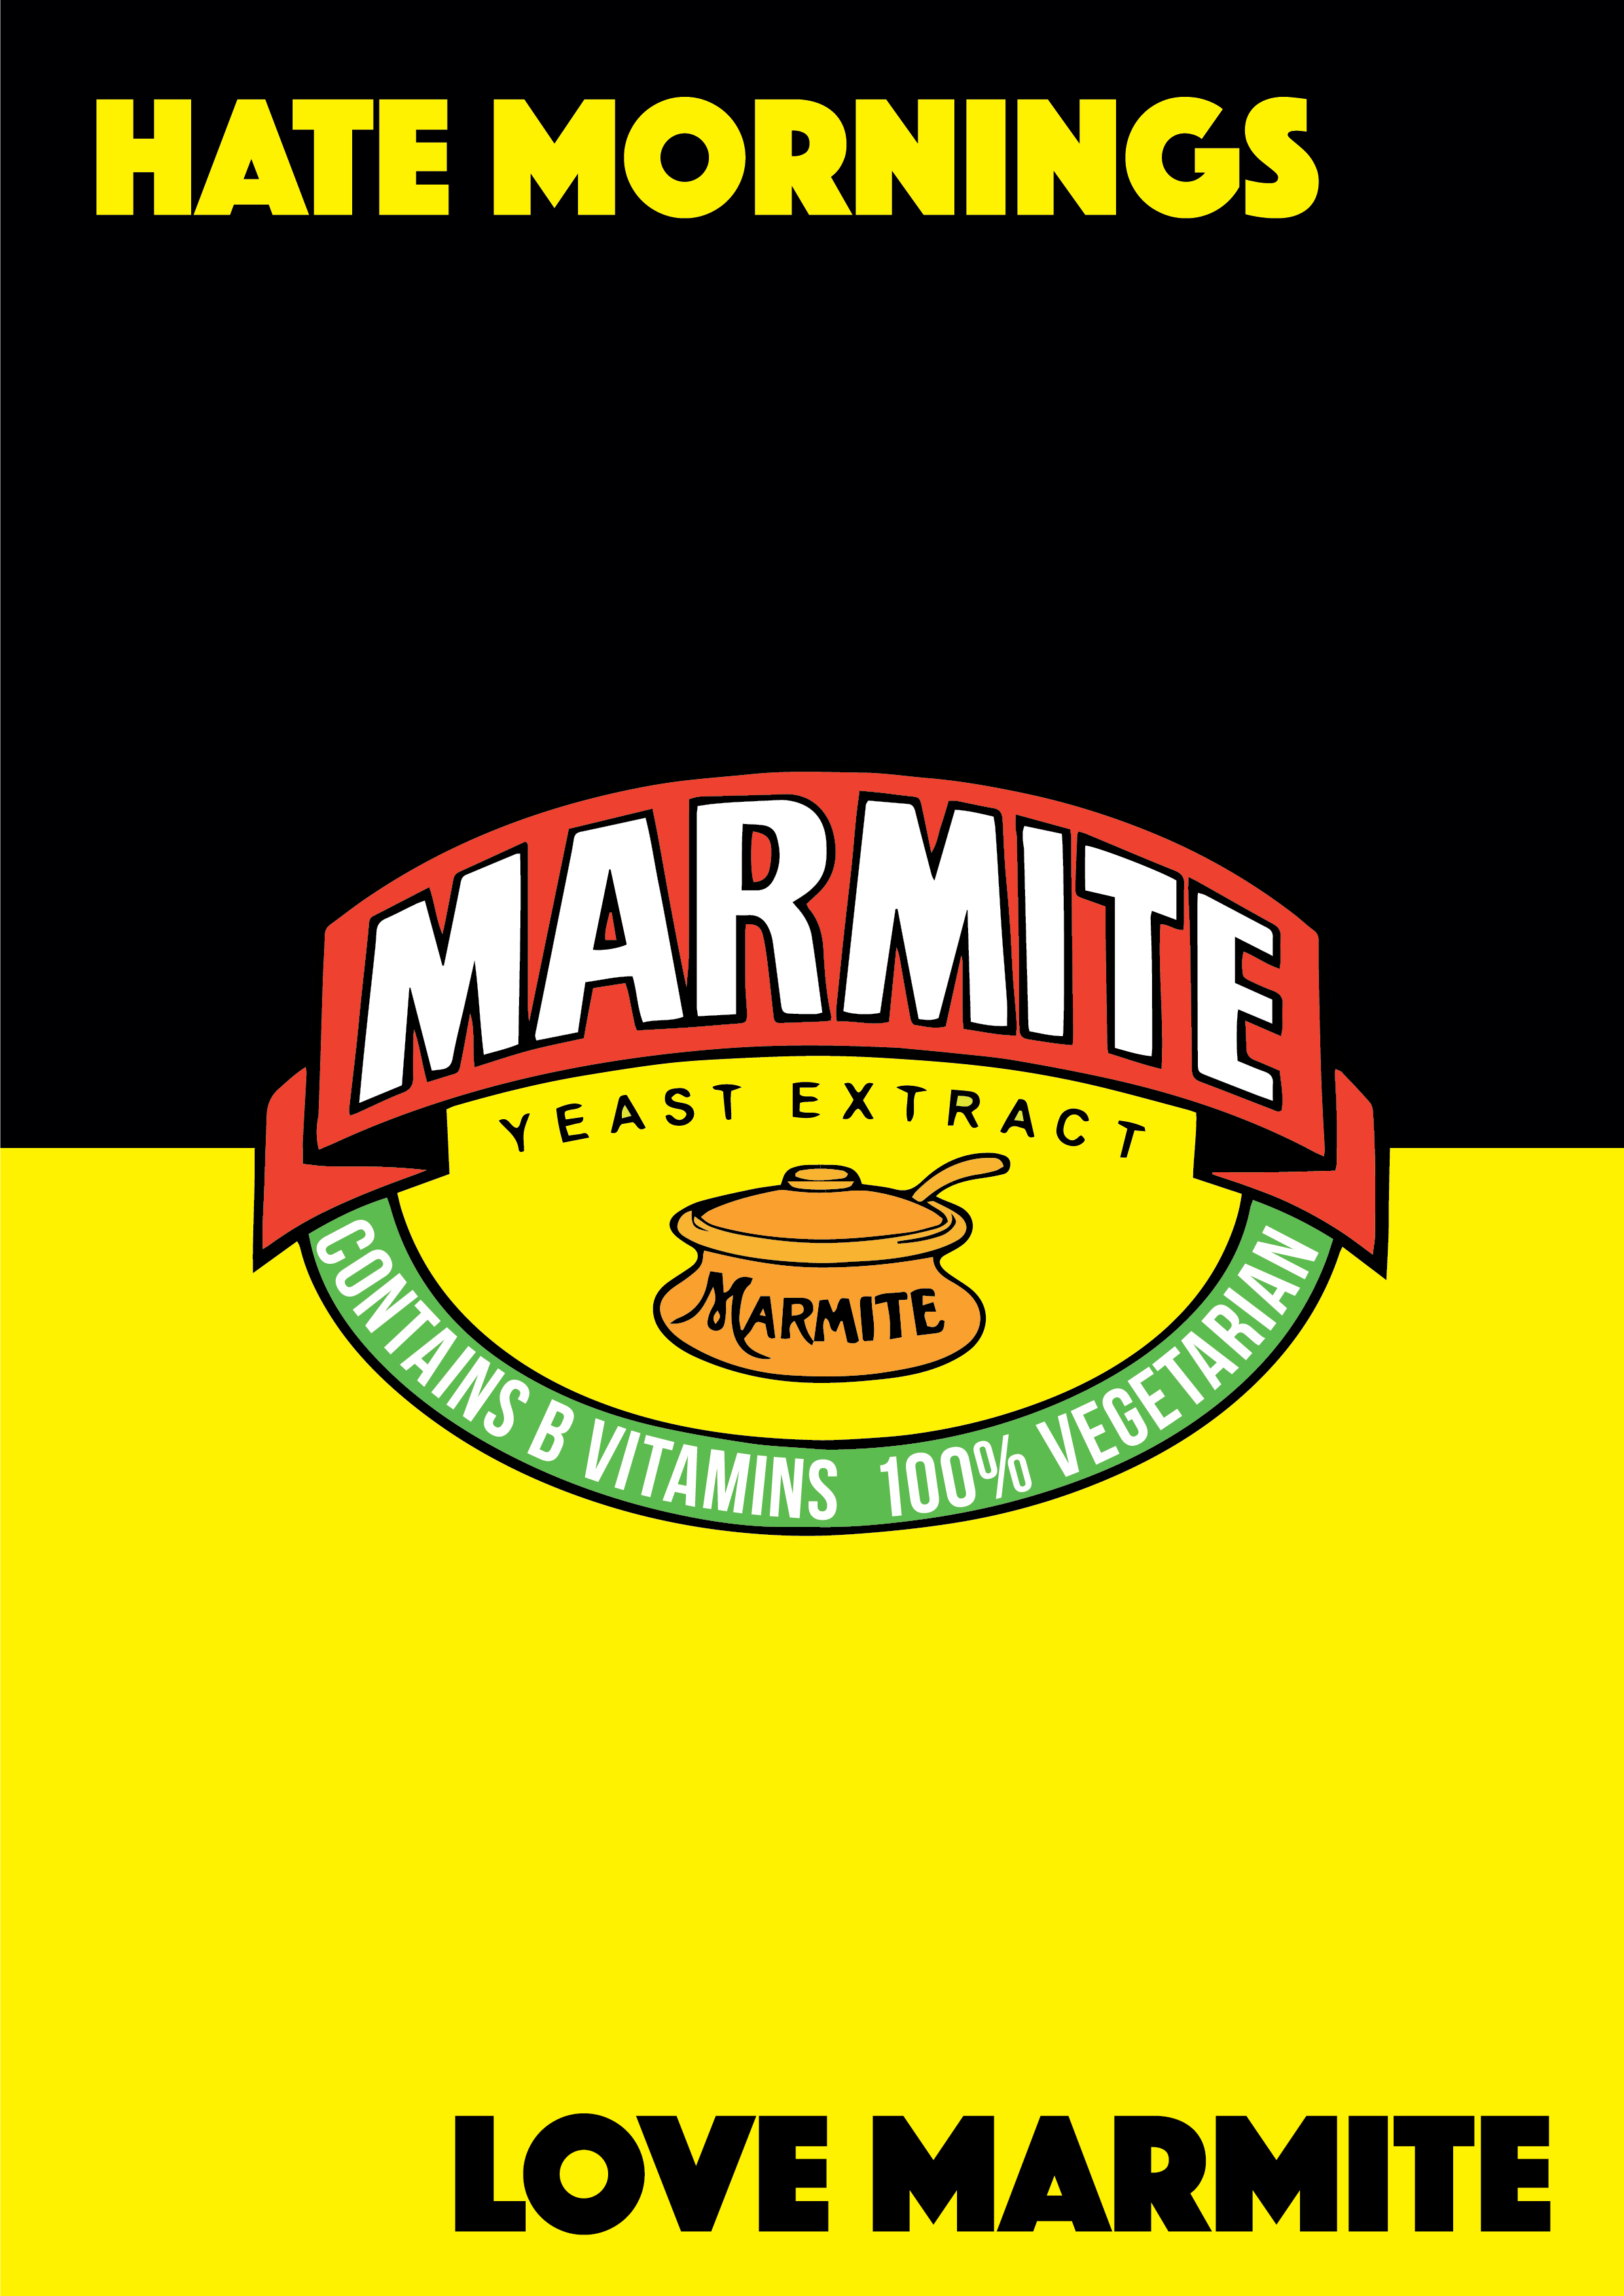 Marmate-02.png